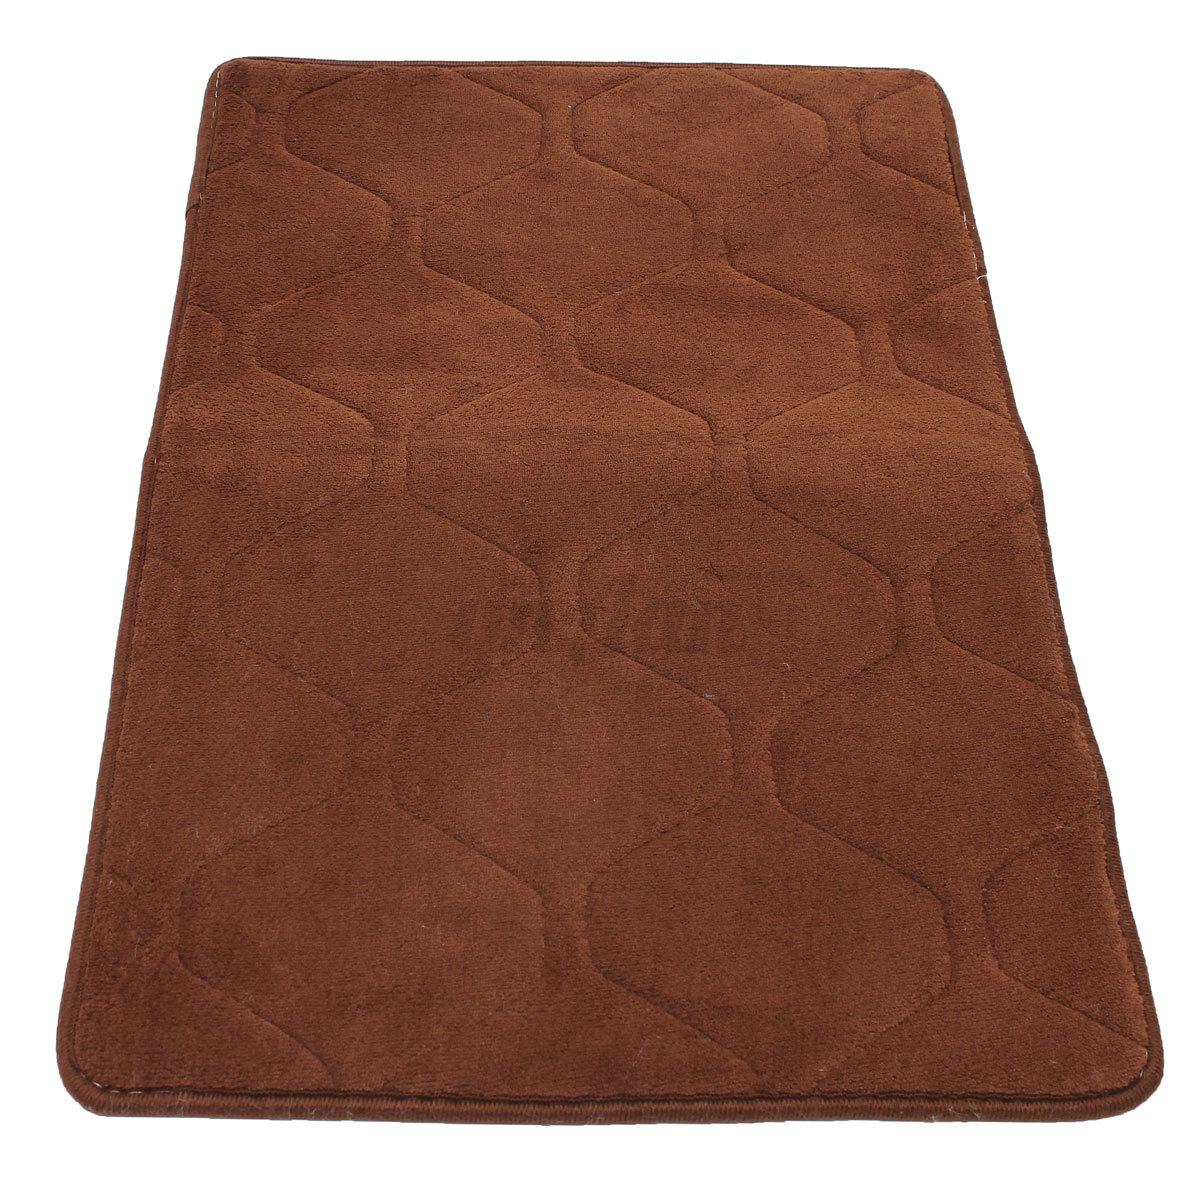 tapis shaggy entree sol velour corail antid rapant absorbant salle de bain salon ebay. Black Bedroom Furniture Sets. Home Design Ideas